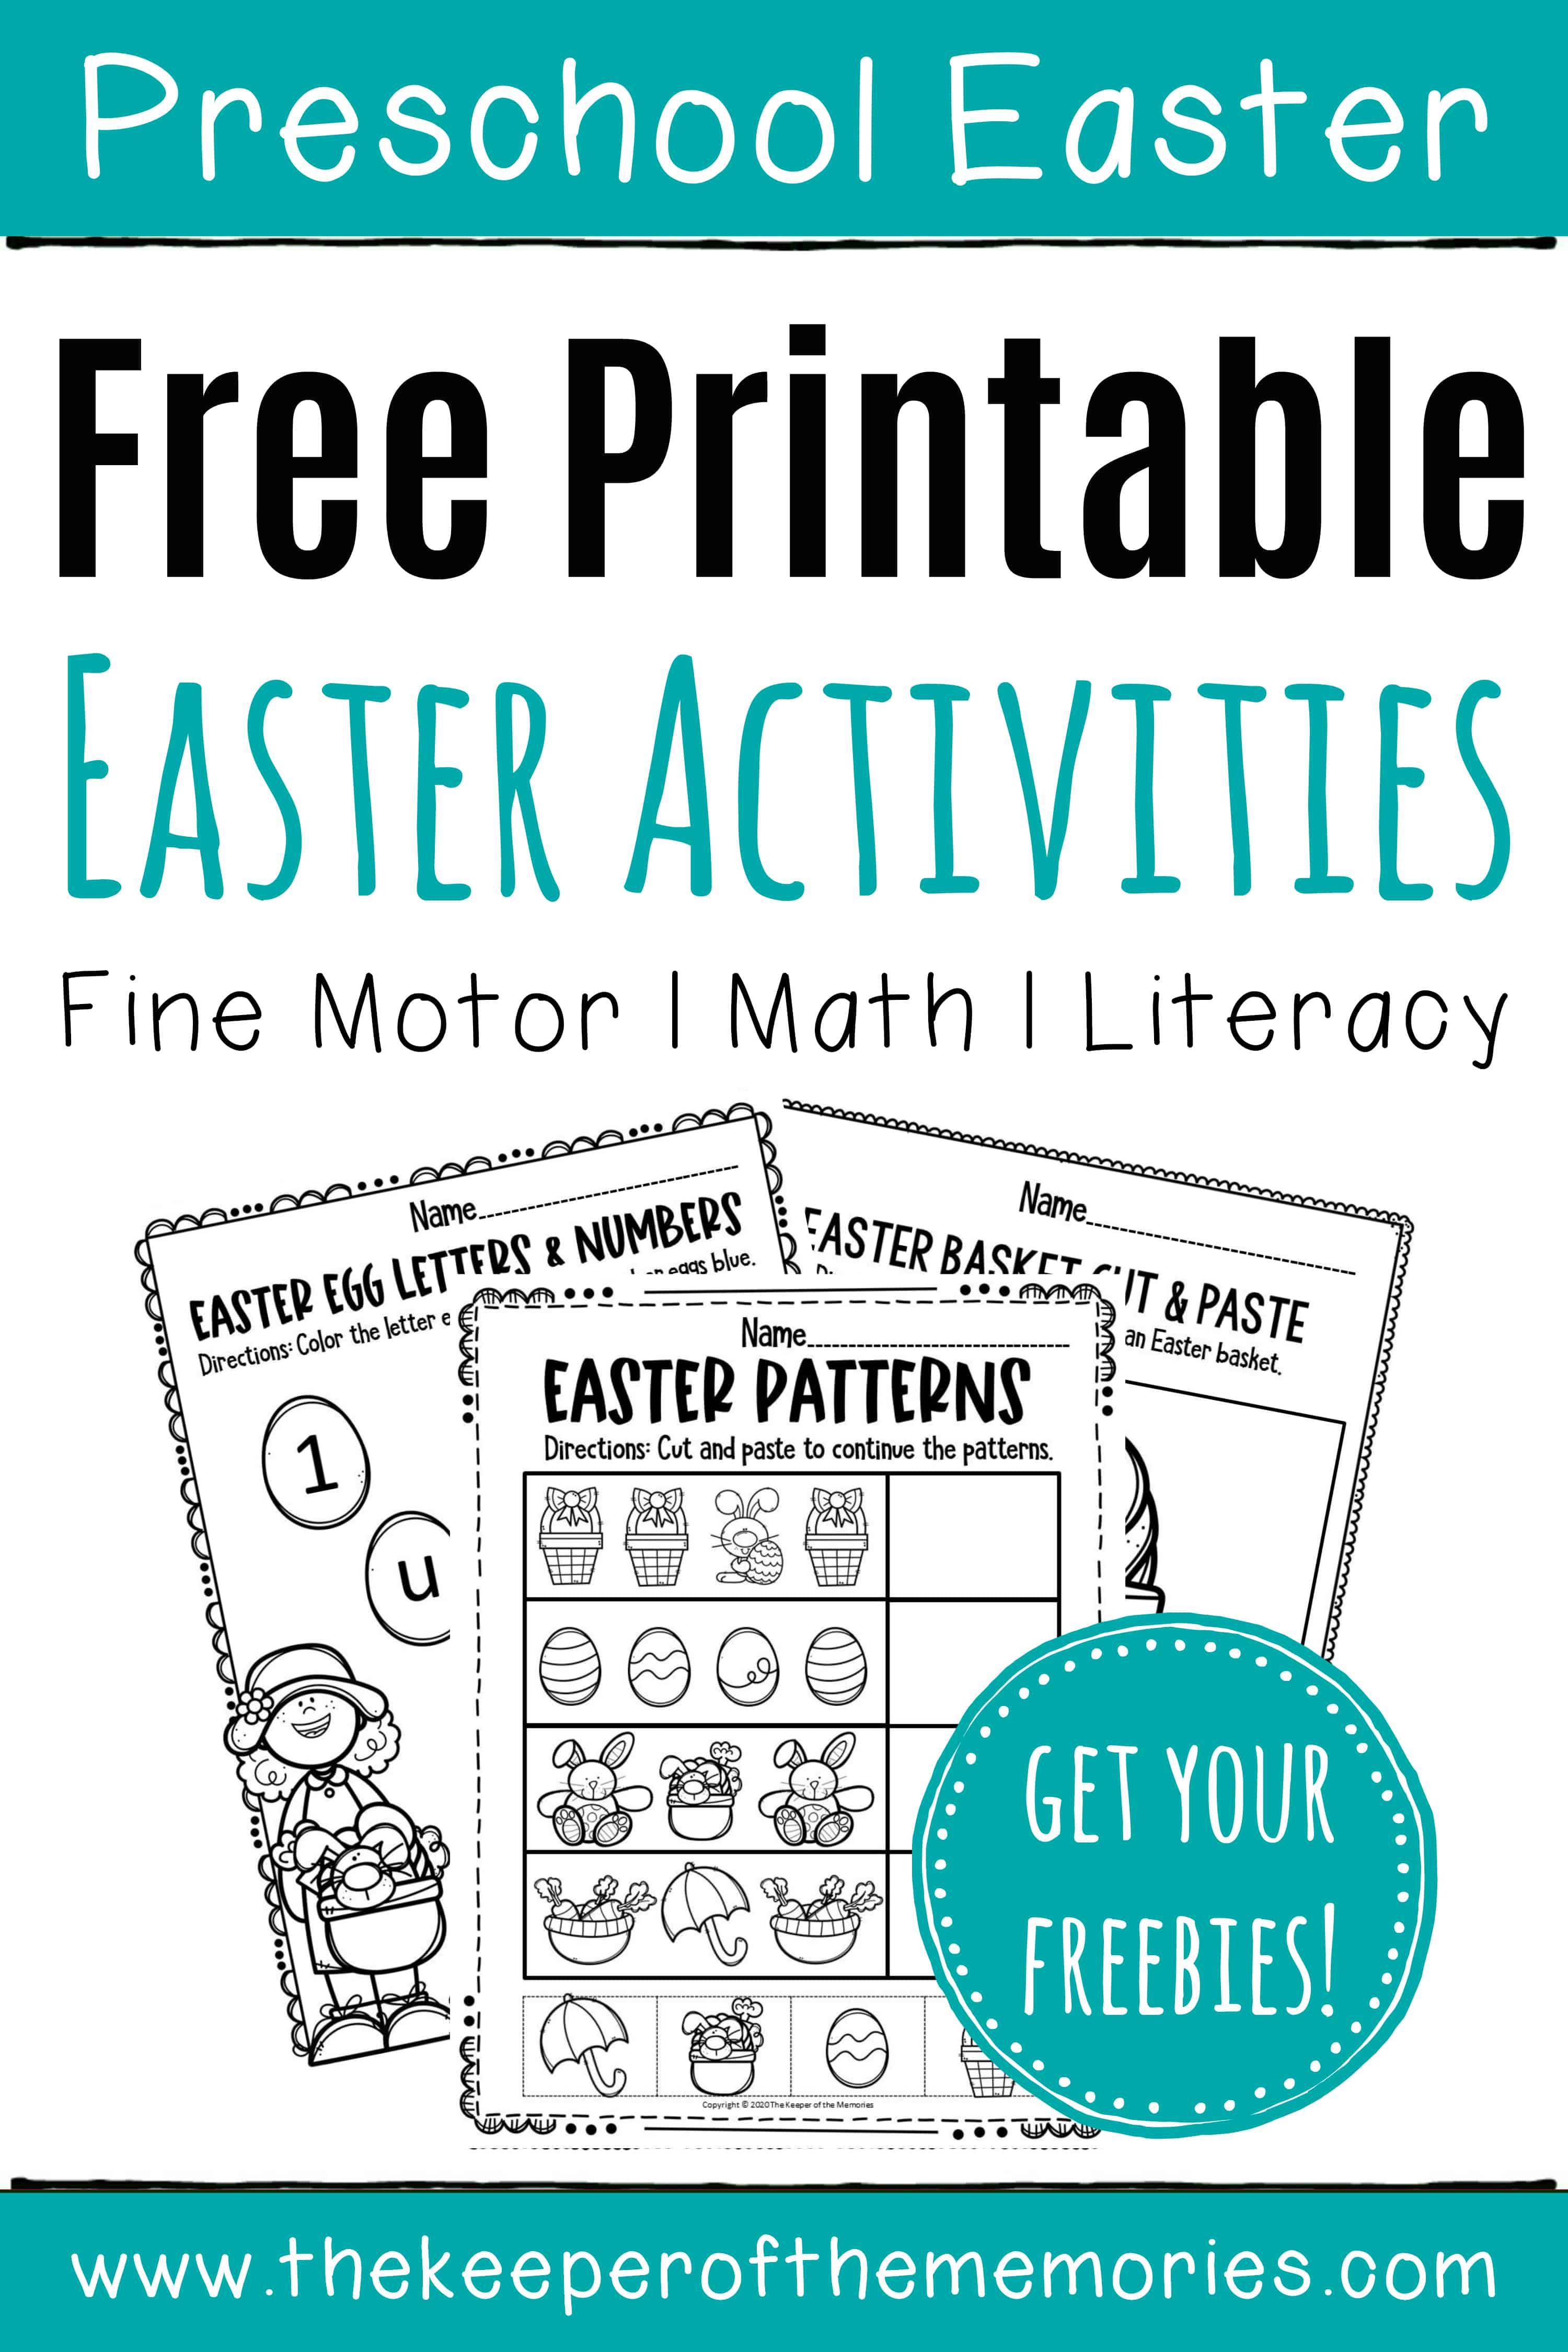 10+ Free Easter Printables for Preschoolers